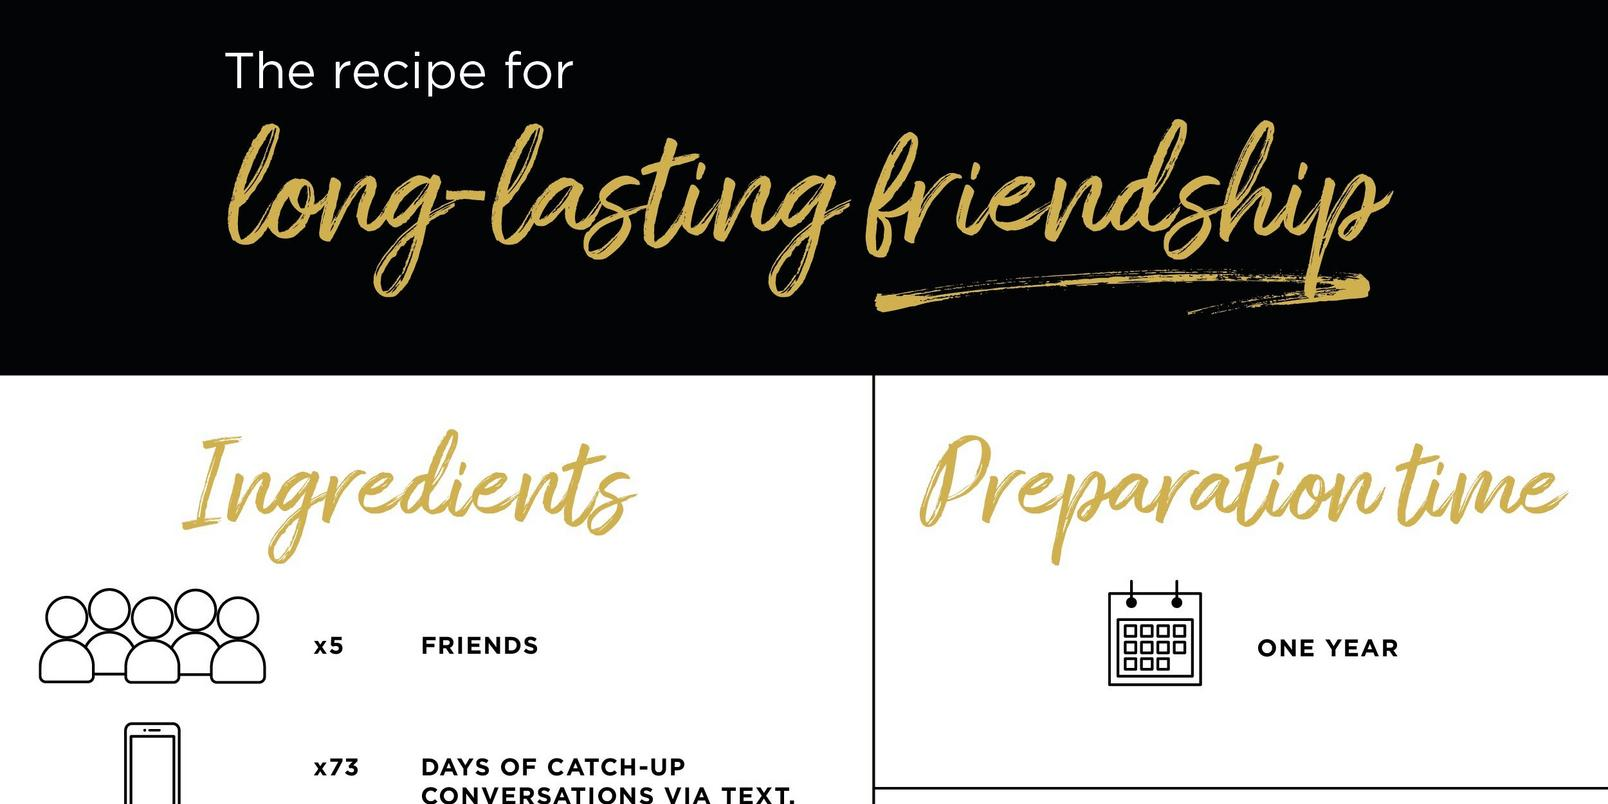 recipe-long-lasting-friendship-2